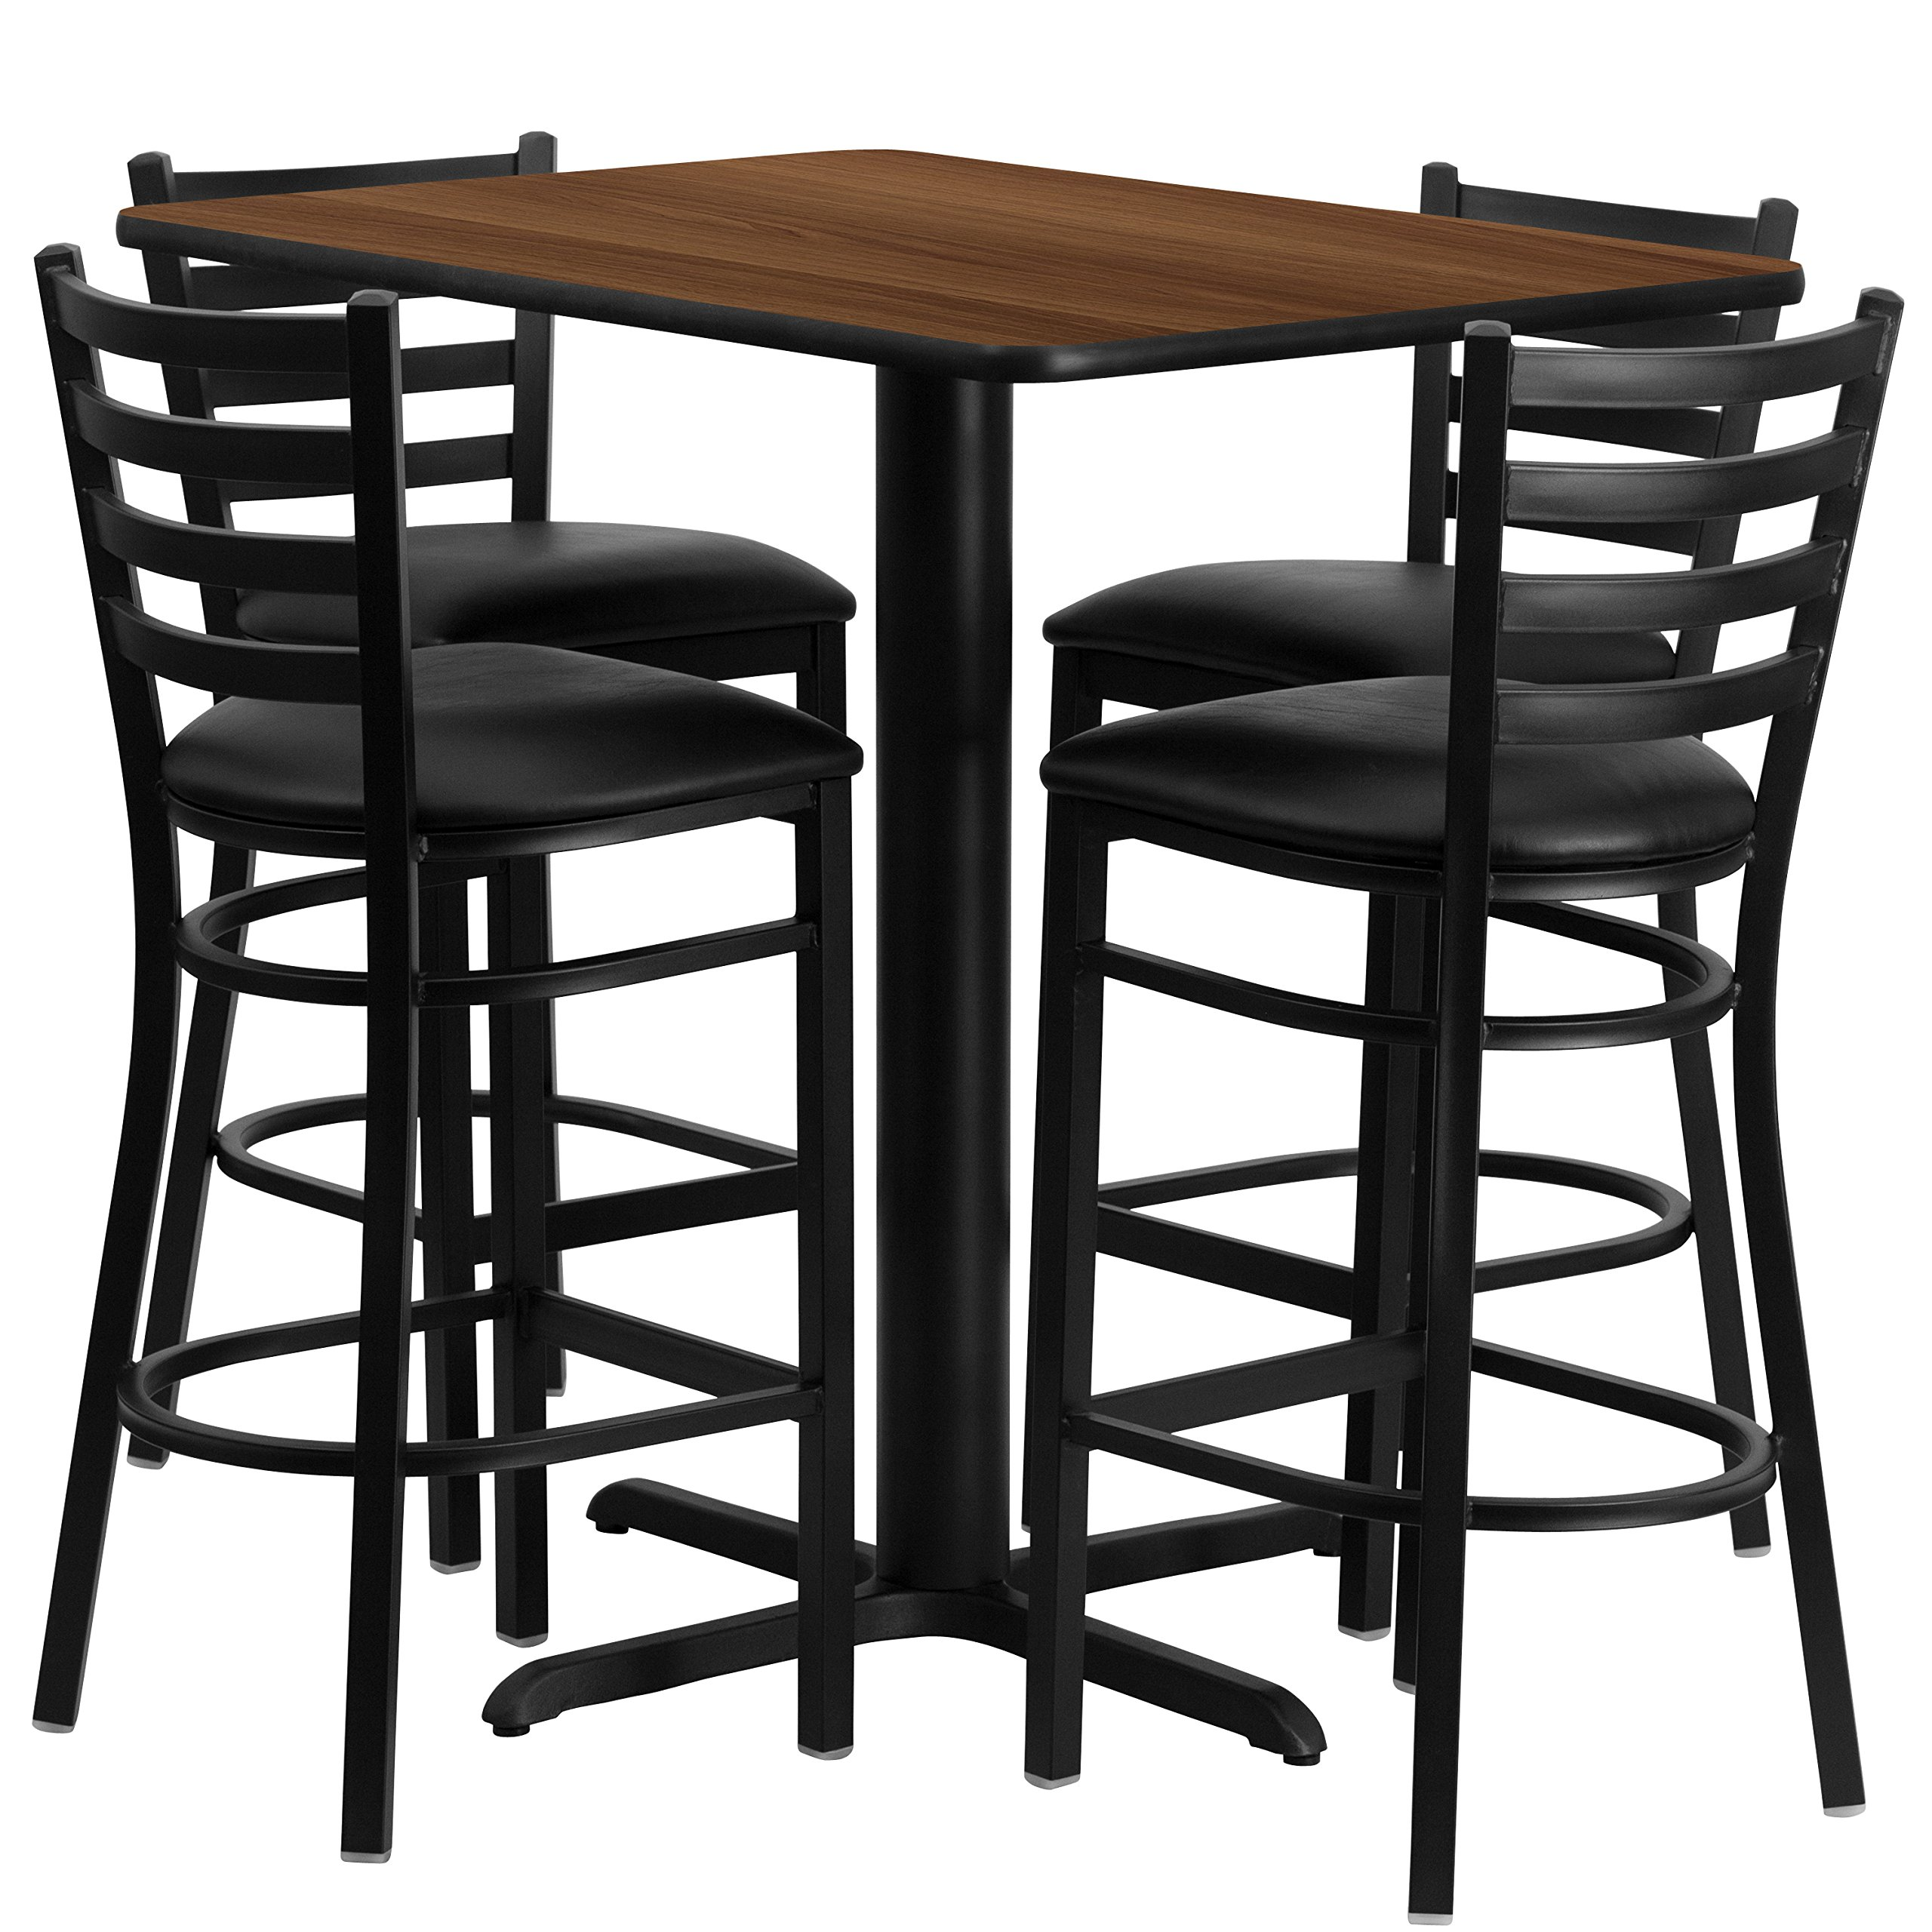 Flash Furniture 24''W x 42''L Rectangular Walnut Laminate Table Set with 4 Ladder Back Metal Barstools - Black Vinyl Seat